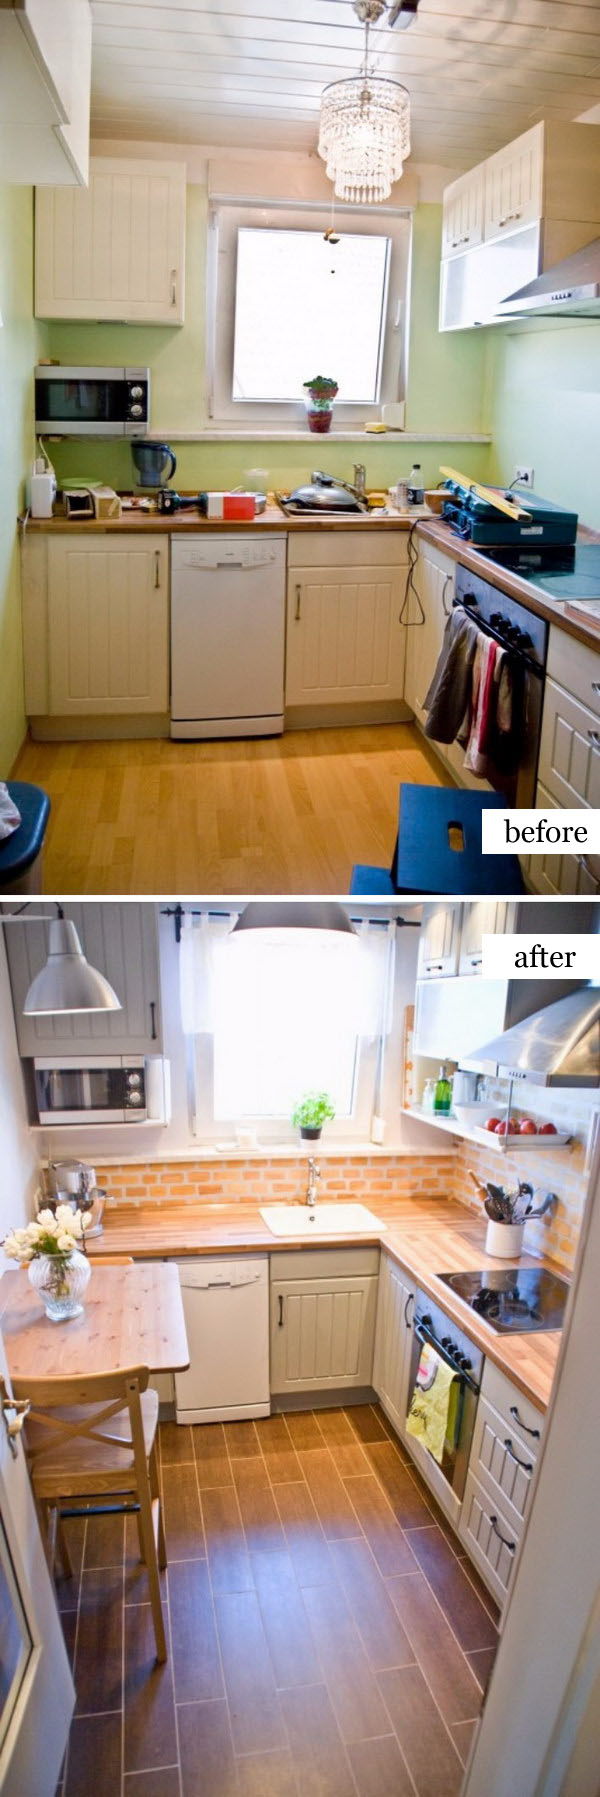 Tiny Kitchen Renovation with Faux Painted Brick Backsplash and Wood Tile Floors.